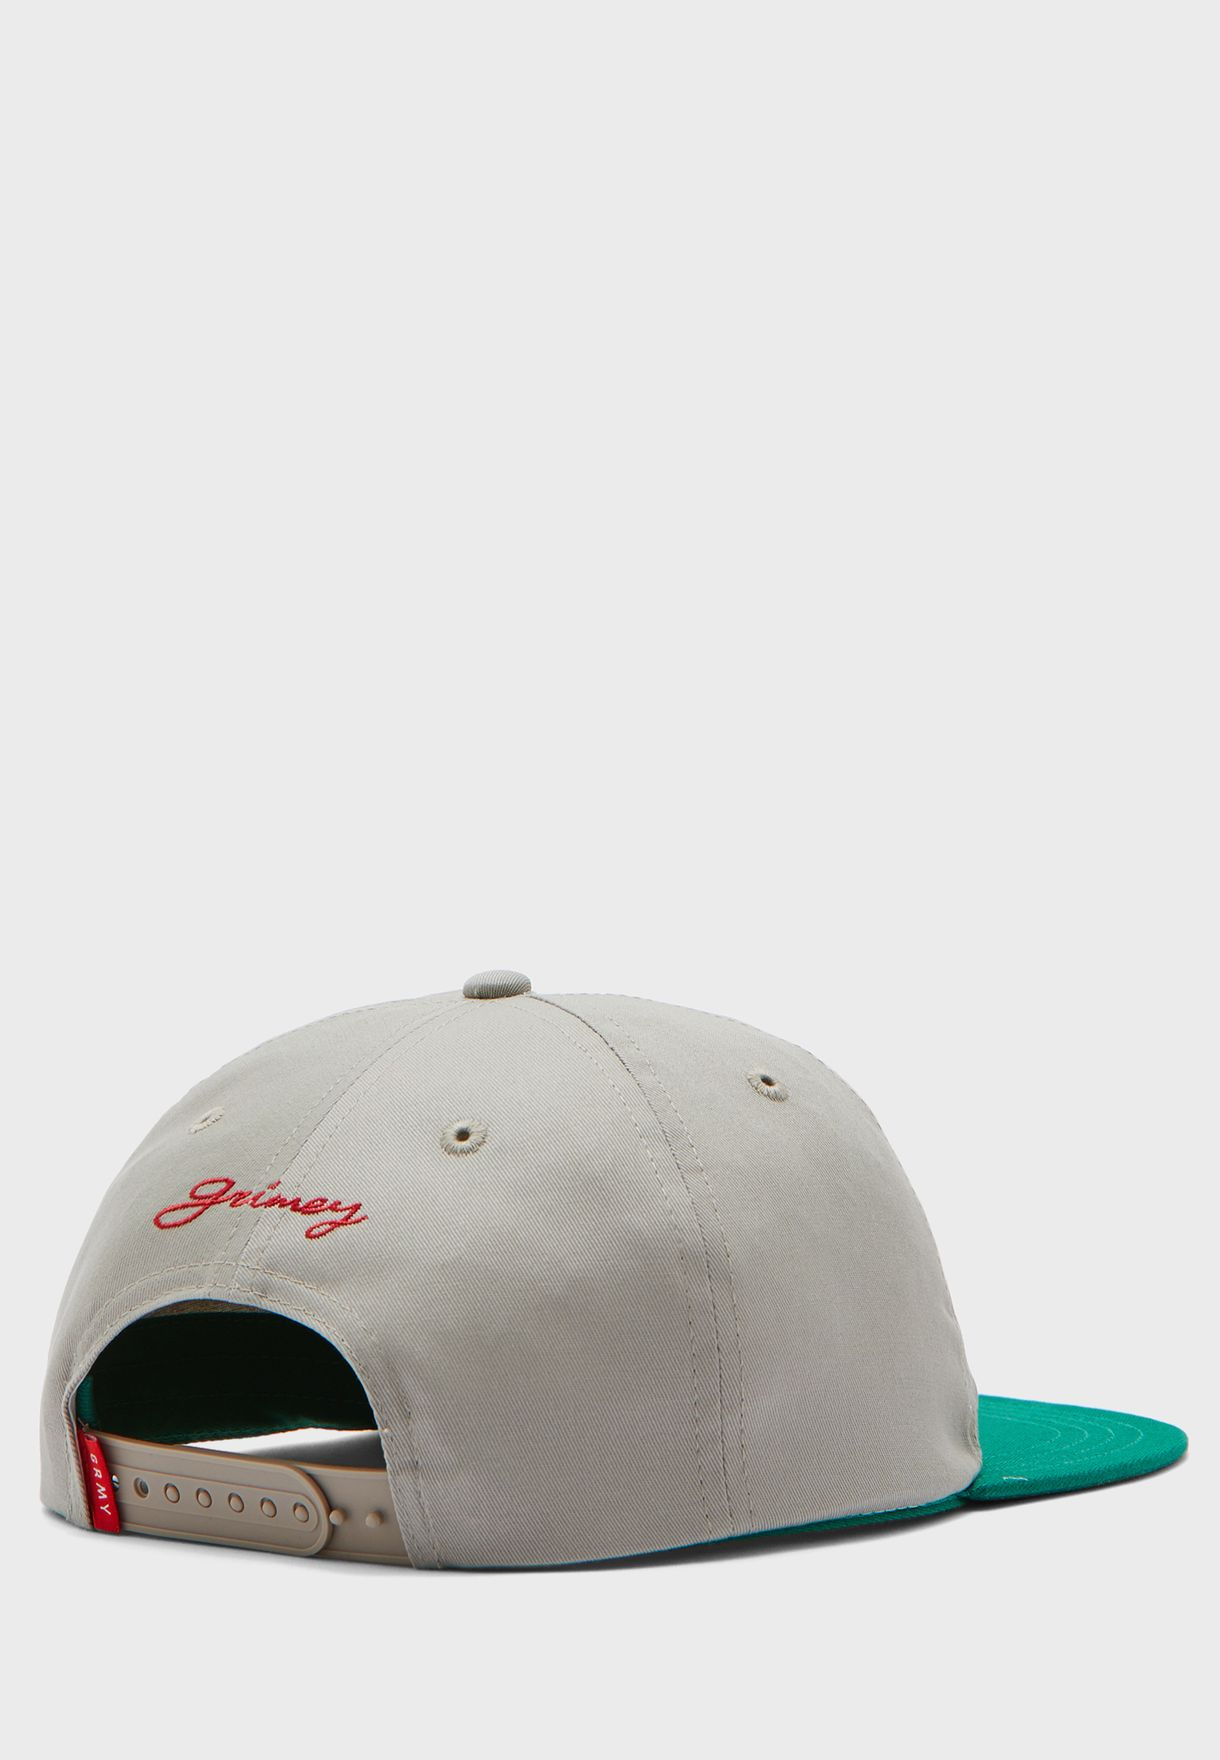 The Loot Cap